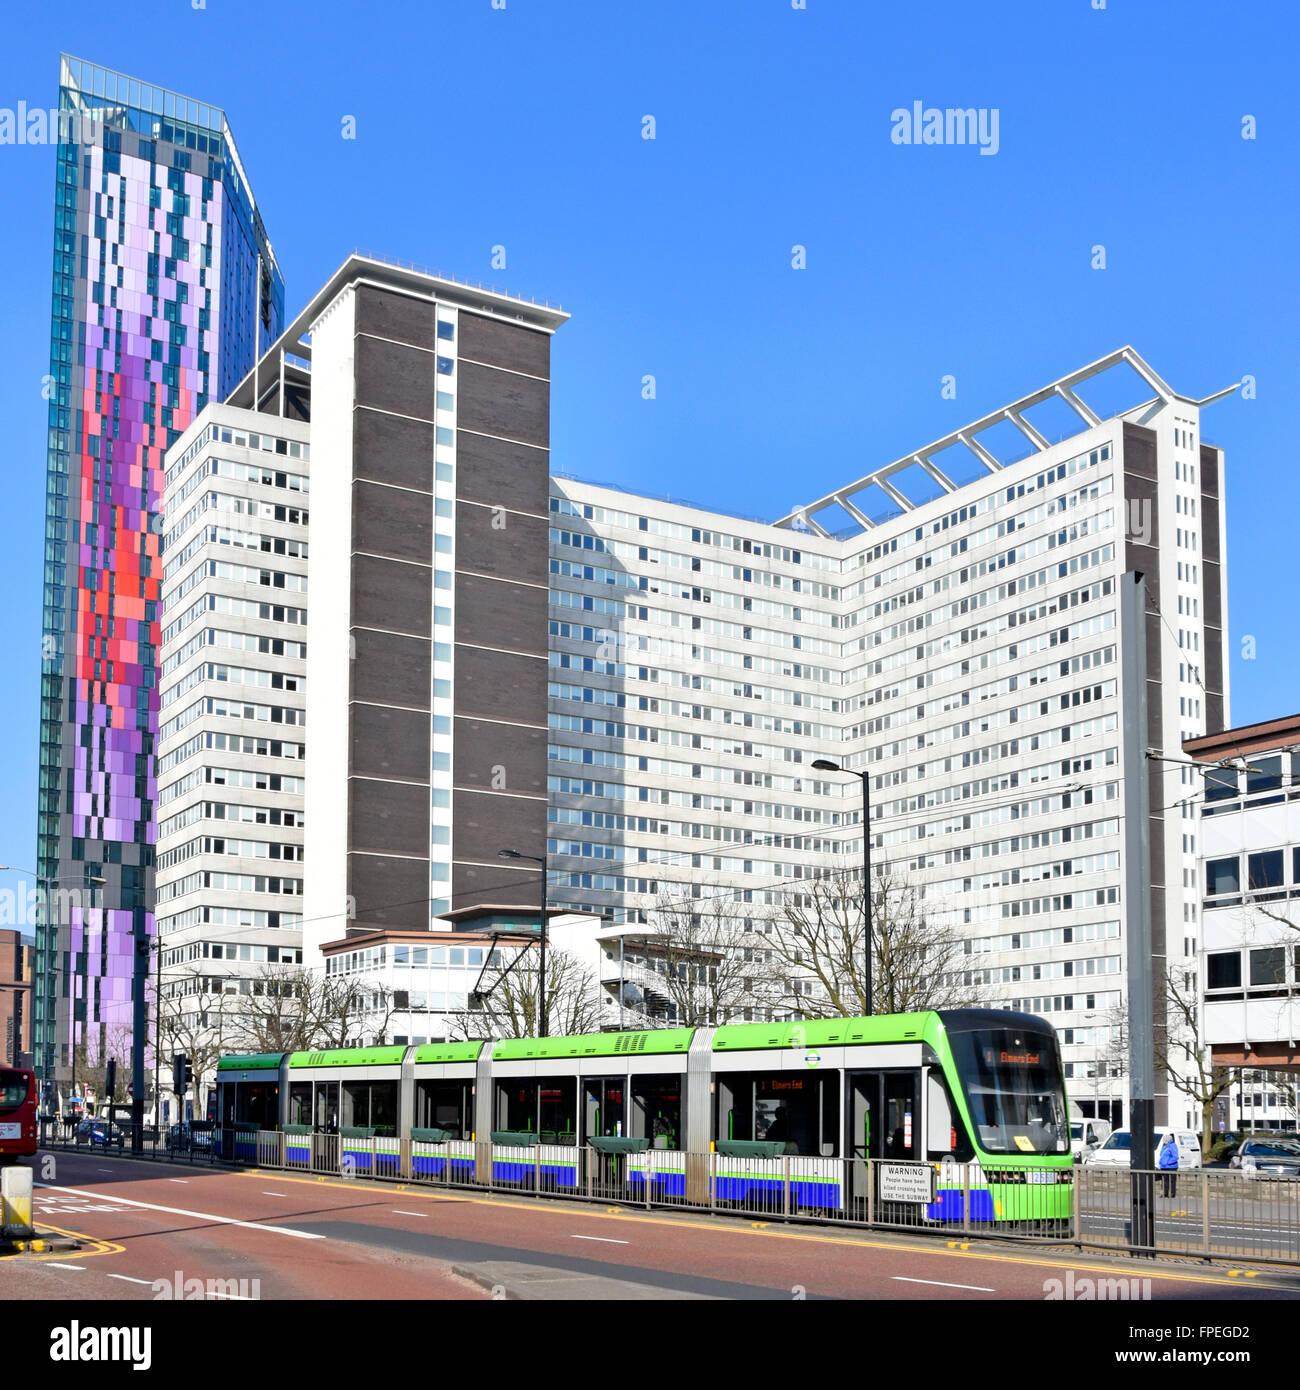 Croydon Tram Passing Lunar House Home Office UK Visas